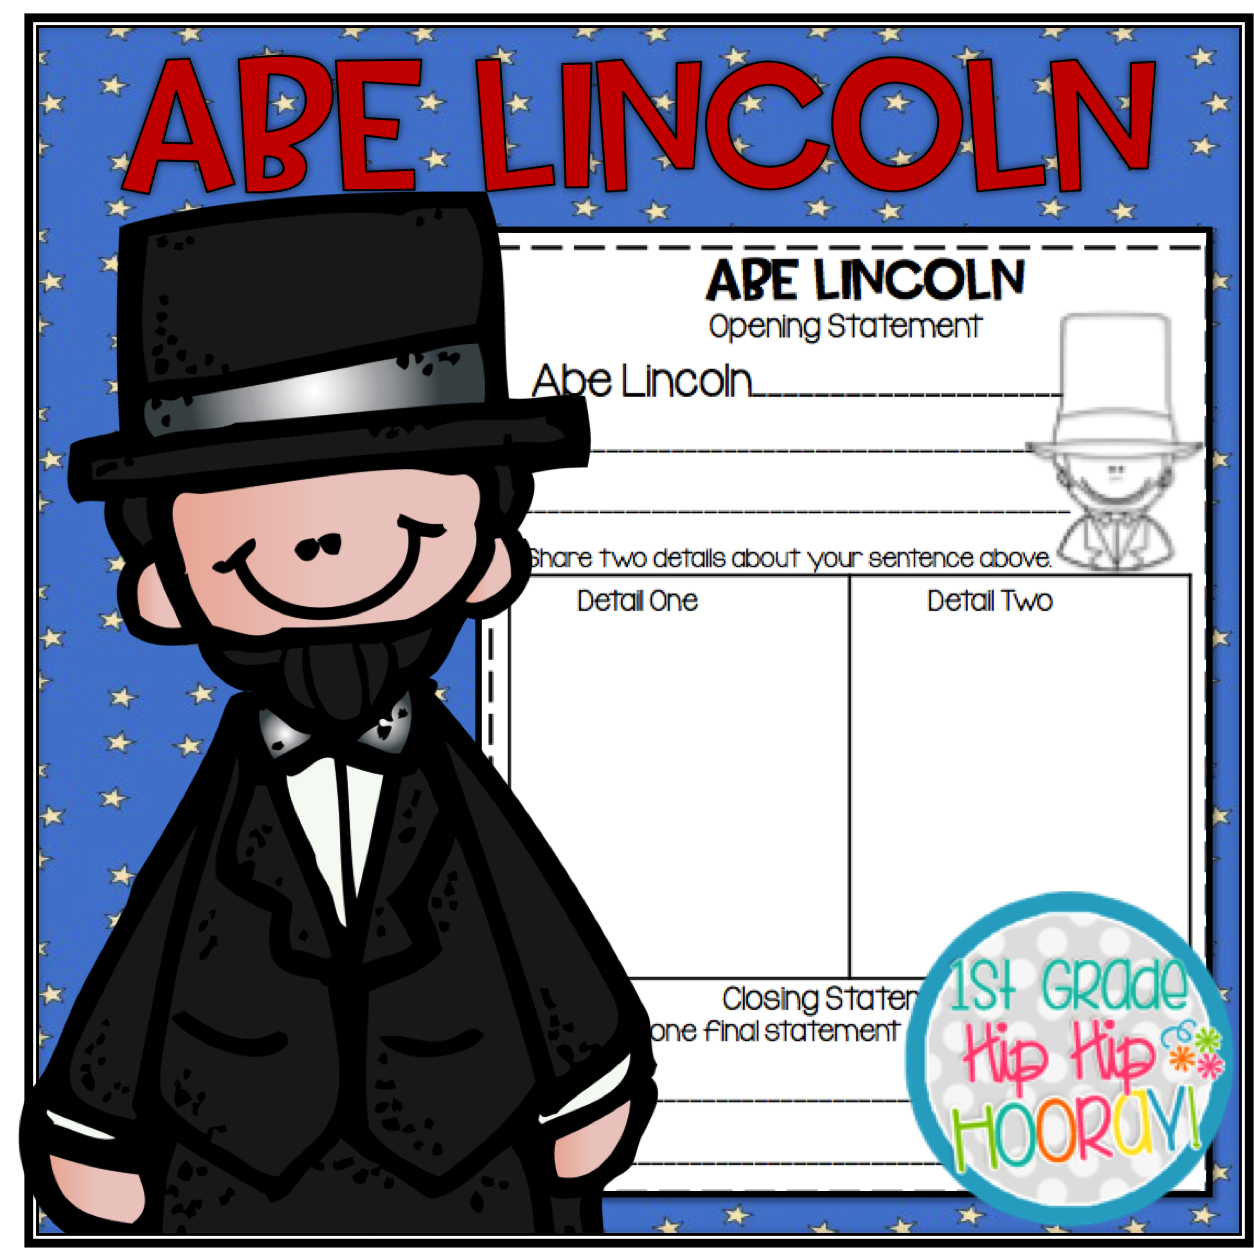 1st Grade Hip Hip Hooray Happy Birthday Abraham Lincoln